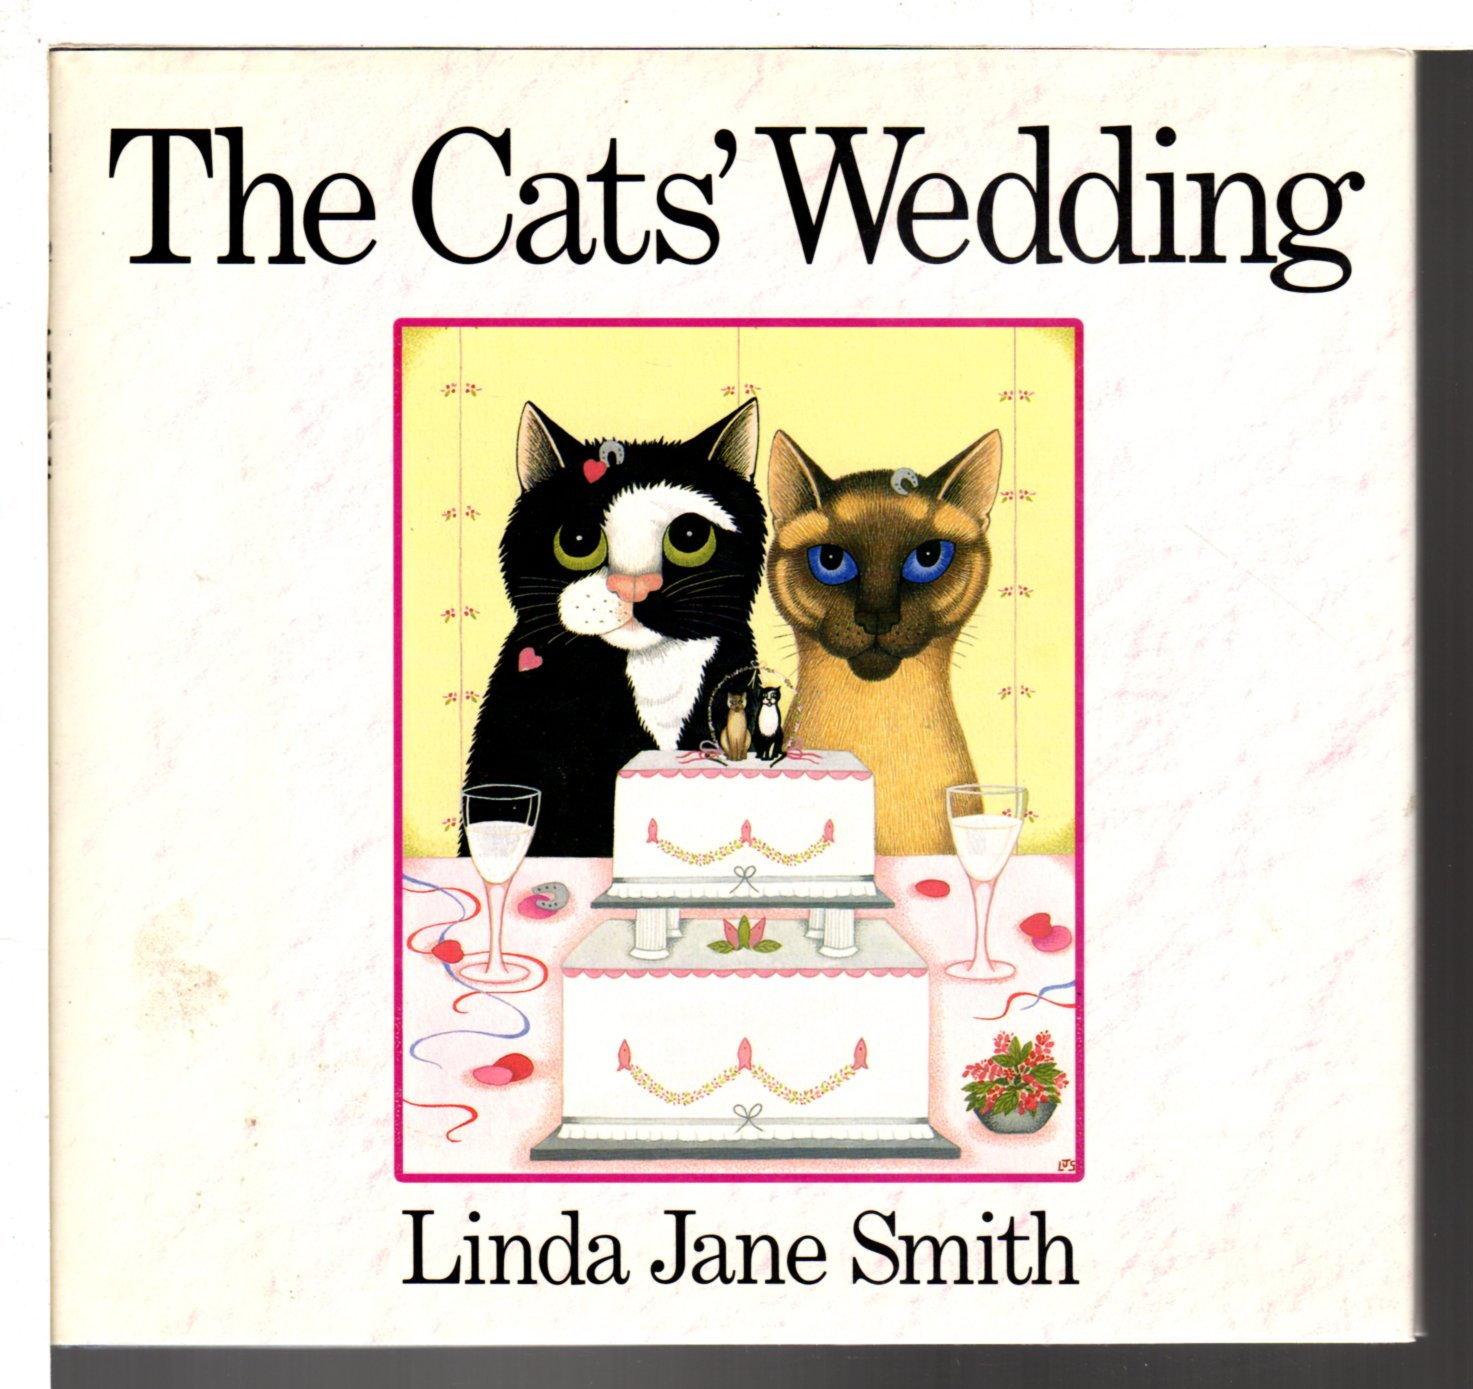 SMITH, LINDA J. - THE CATS' WEDDING.